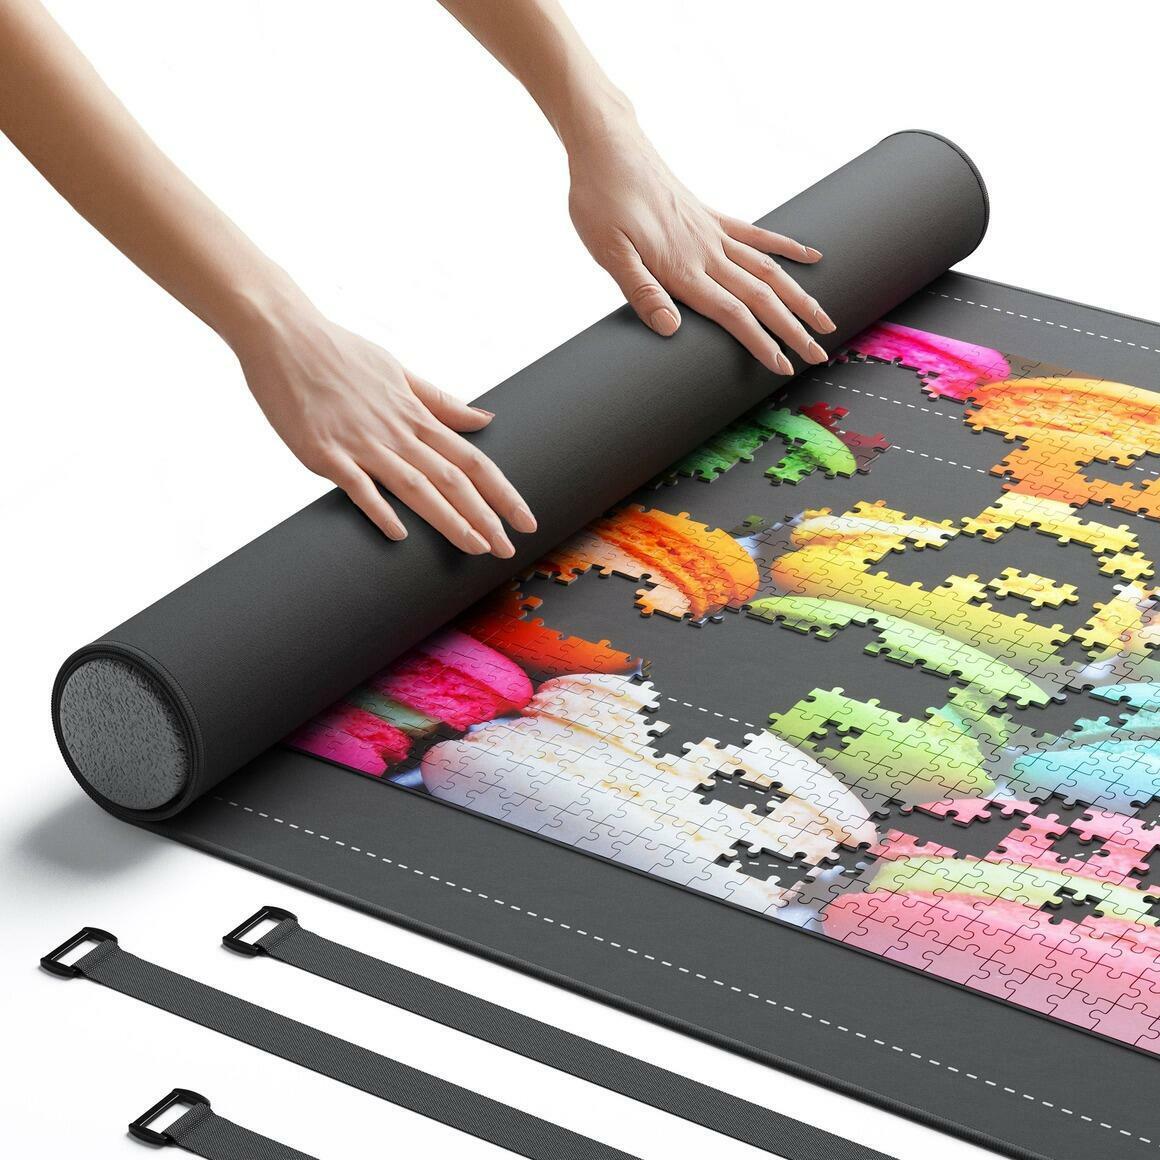 Newverest Jigsaw Puzzle Mat Roll Up | Trada Marketplace